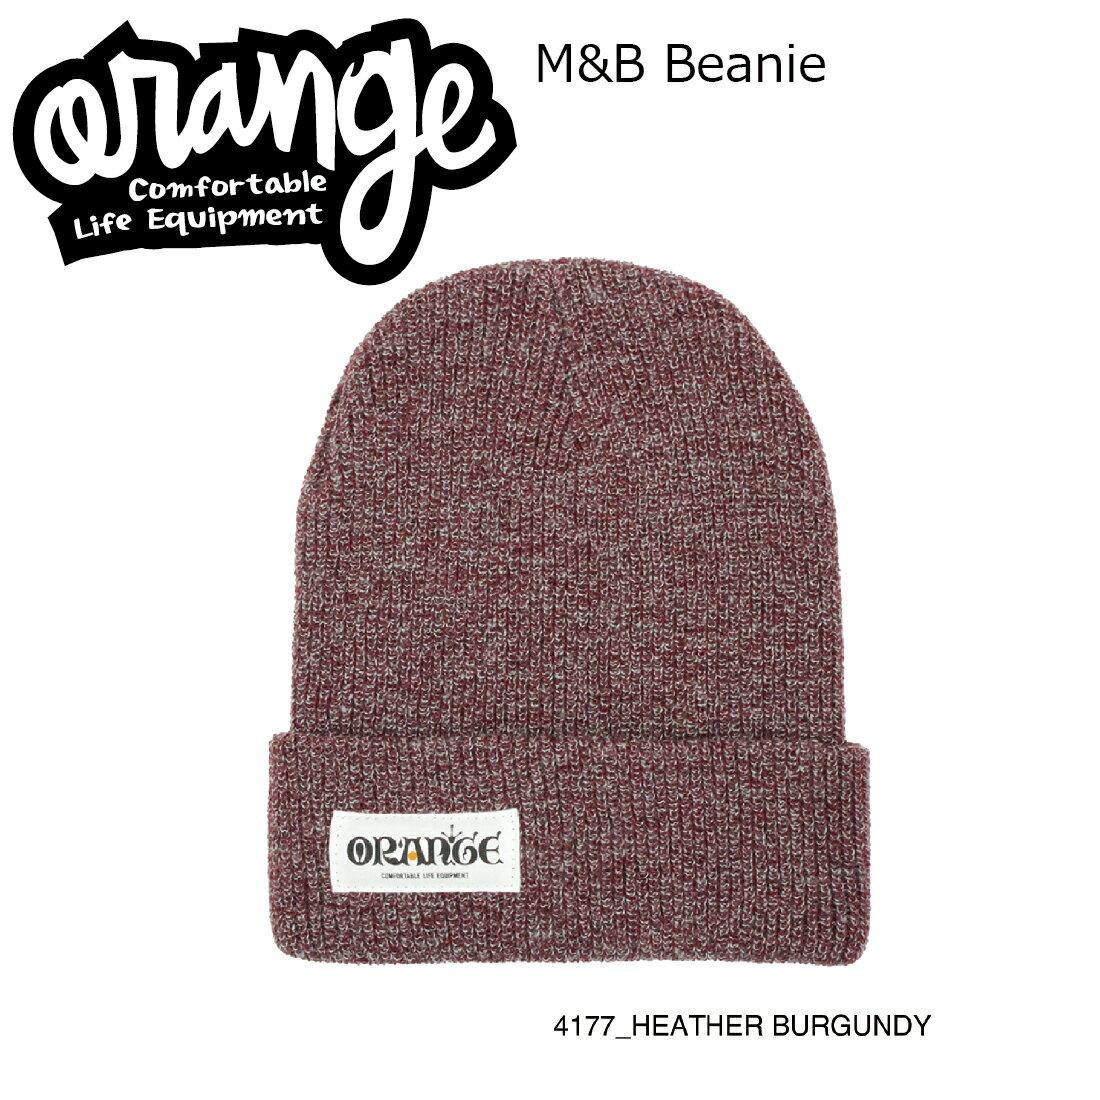 Oran'ge M&B Beanie 4177 HEATHER BURGUNDY オレンジ エムアンドビー ビーニー ニットキャップ 2つ折り